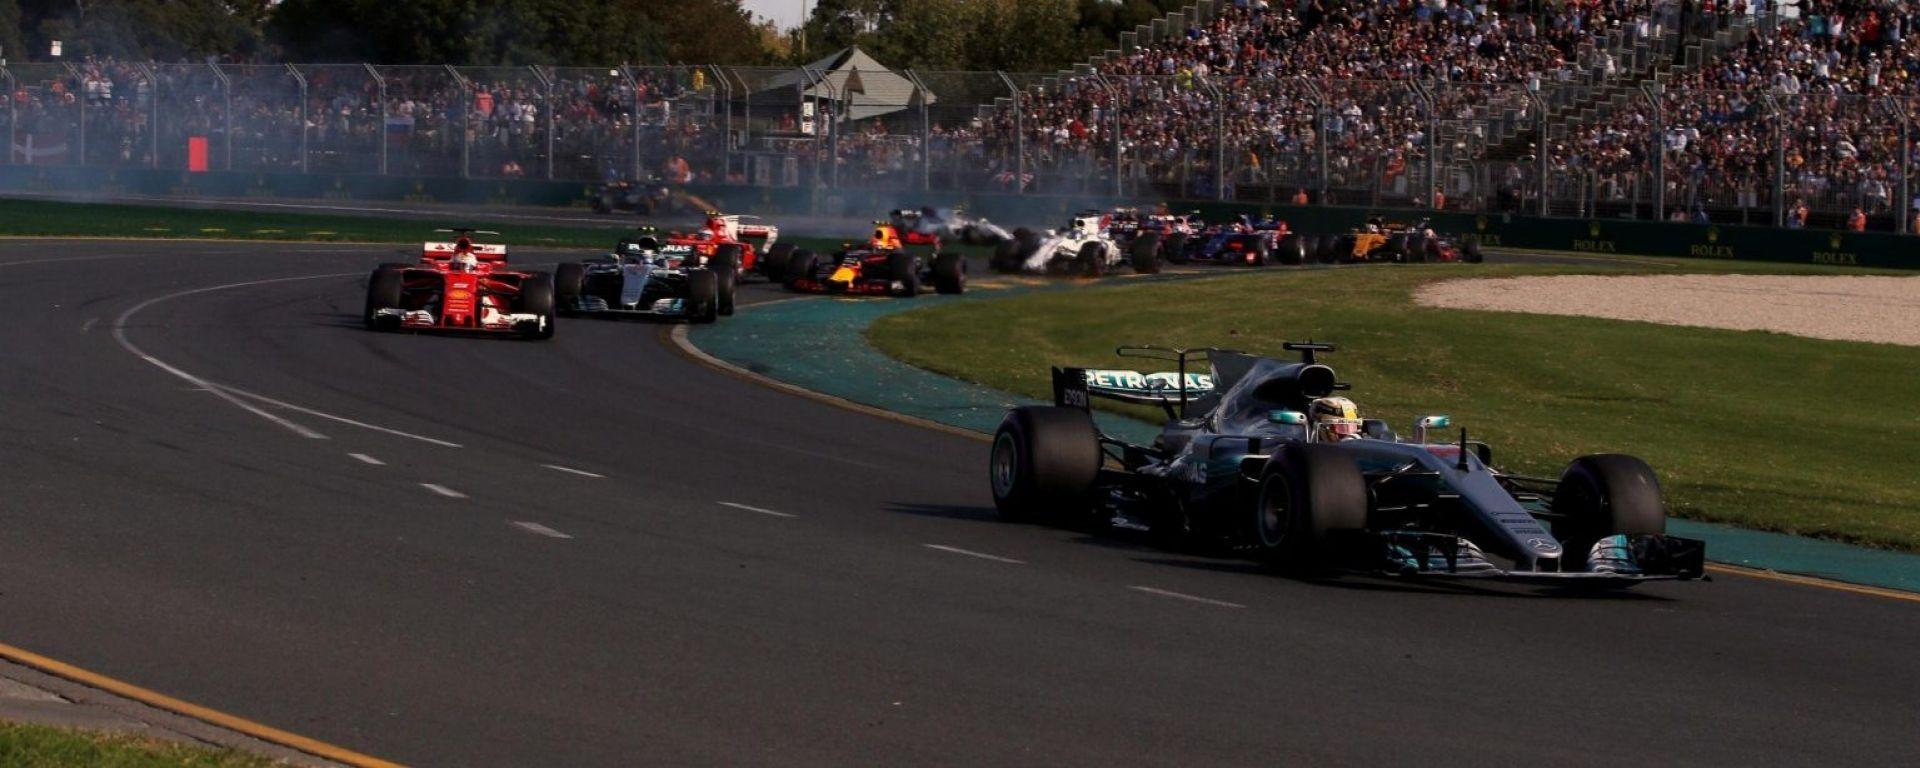 Formula 1